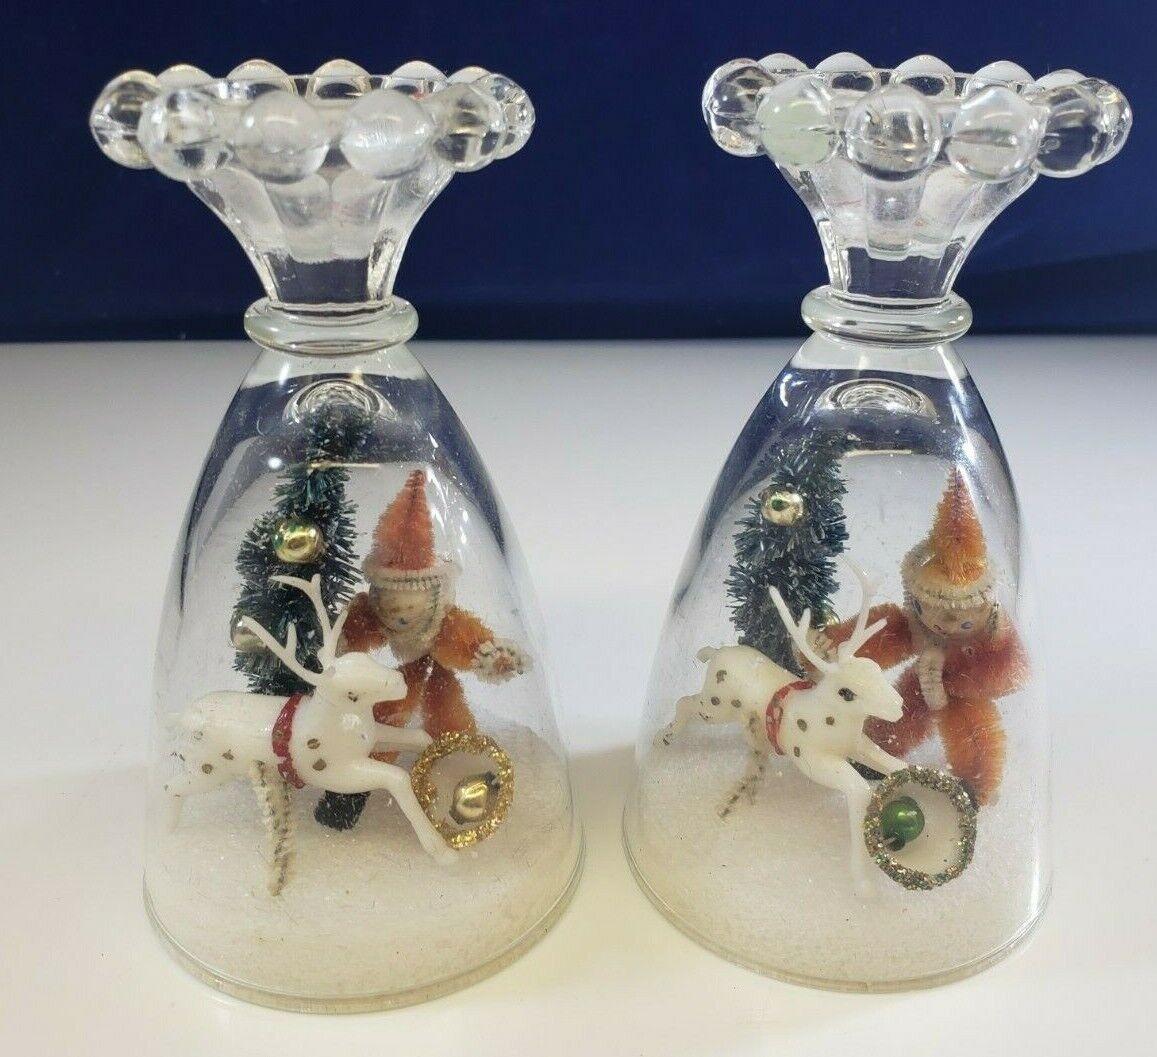 Vintage Anchor Hocking Boopie Glassware Christmas Candle Holder Handmade  - $19.99